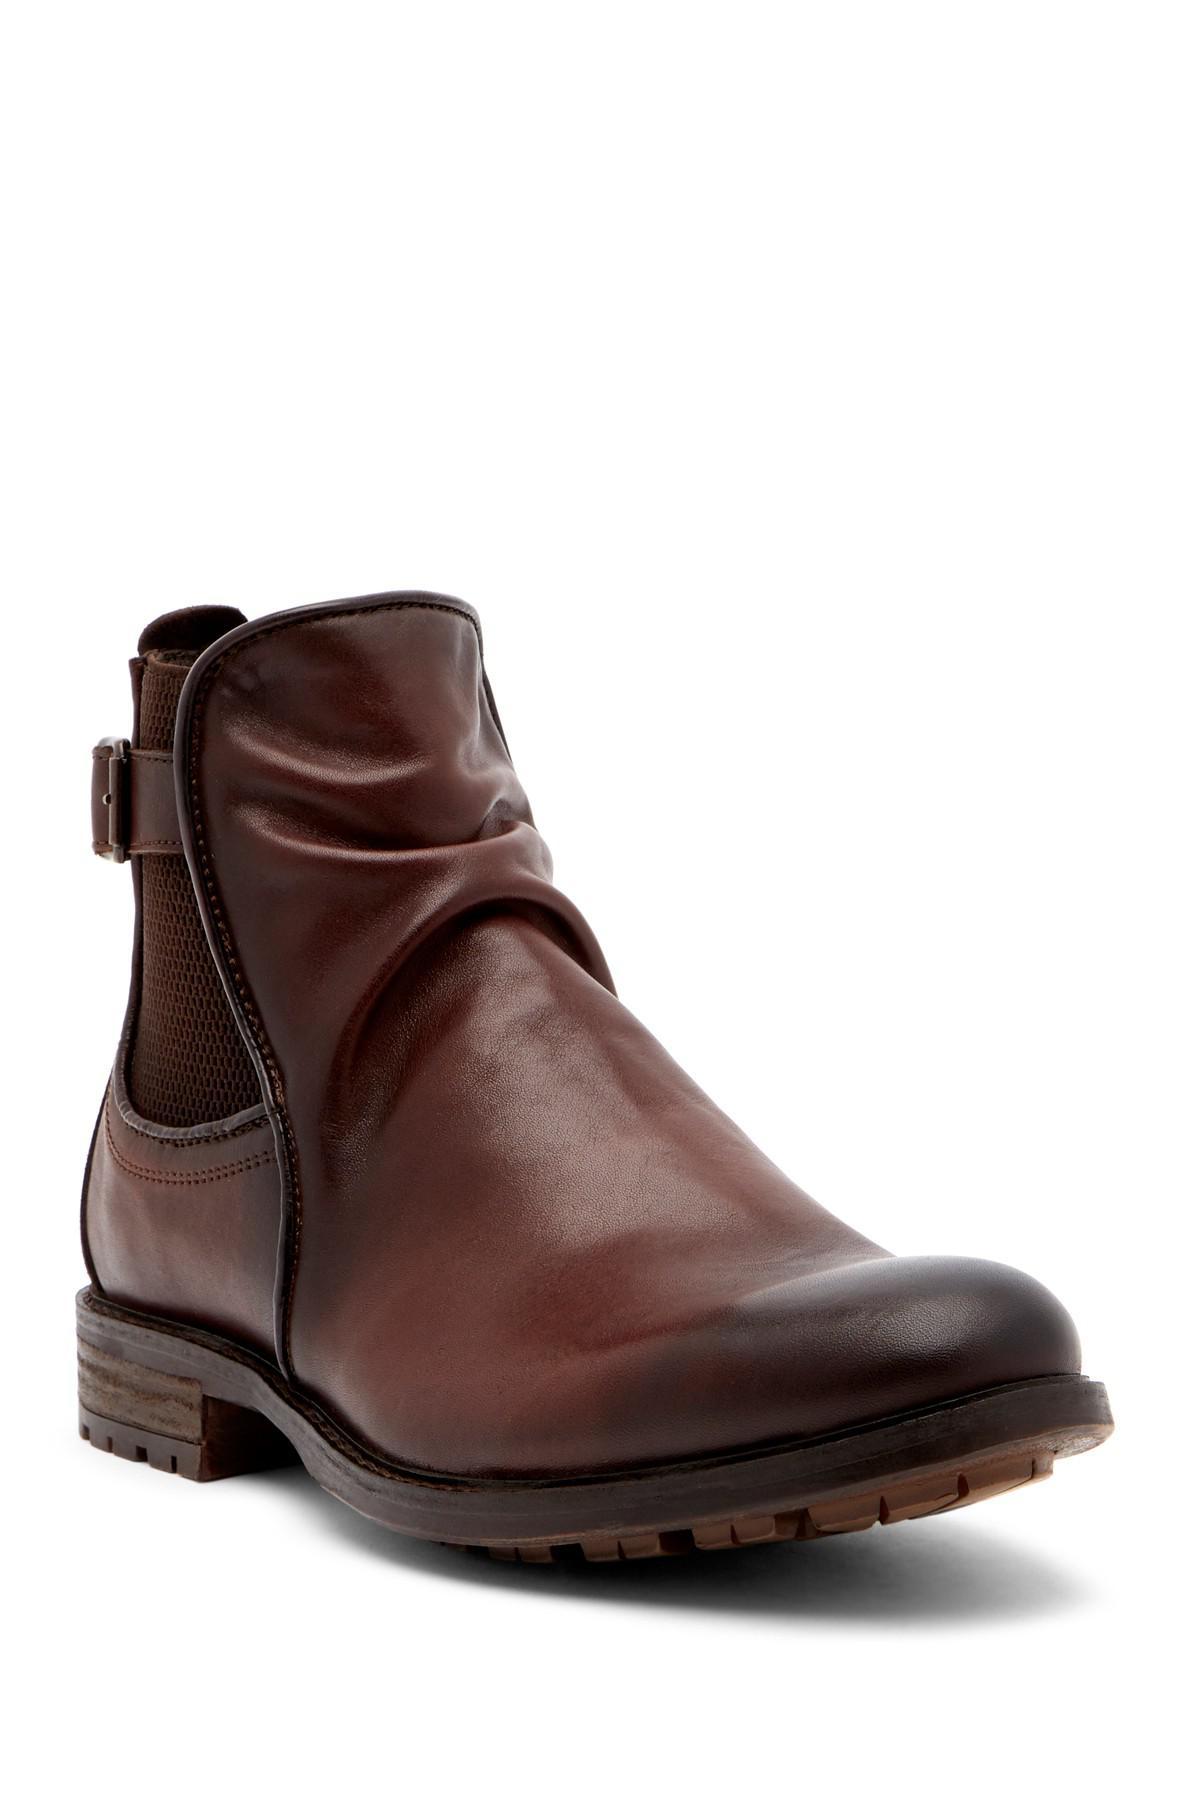 72944d6d7ba Lyst - Steve Madden Loren Leather Boot in Brown for Men